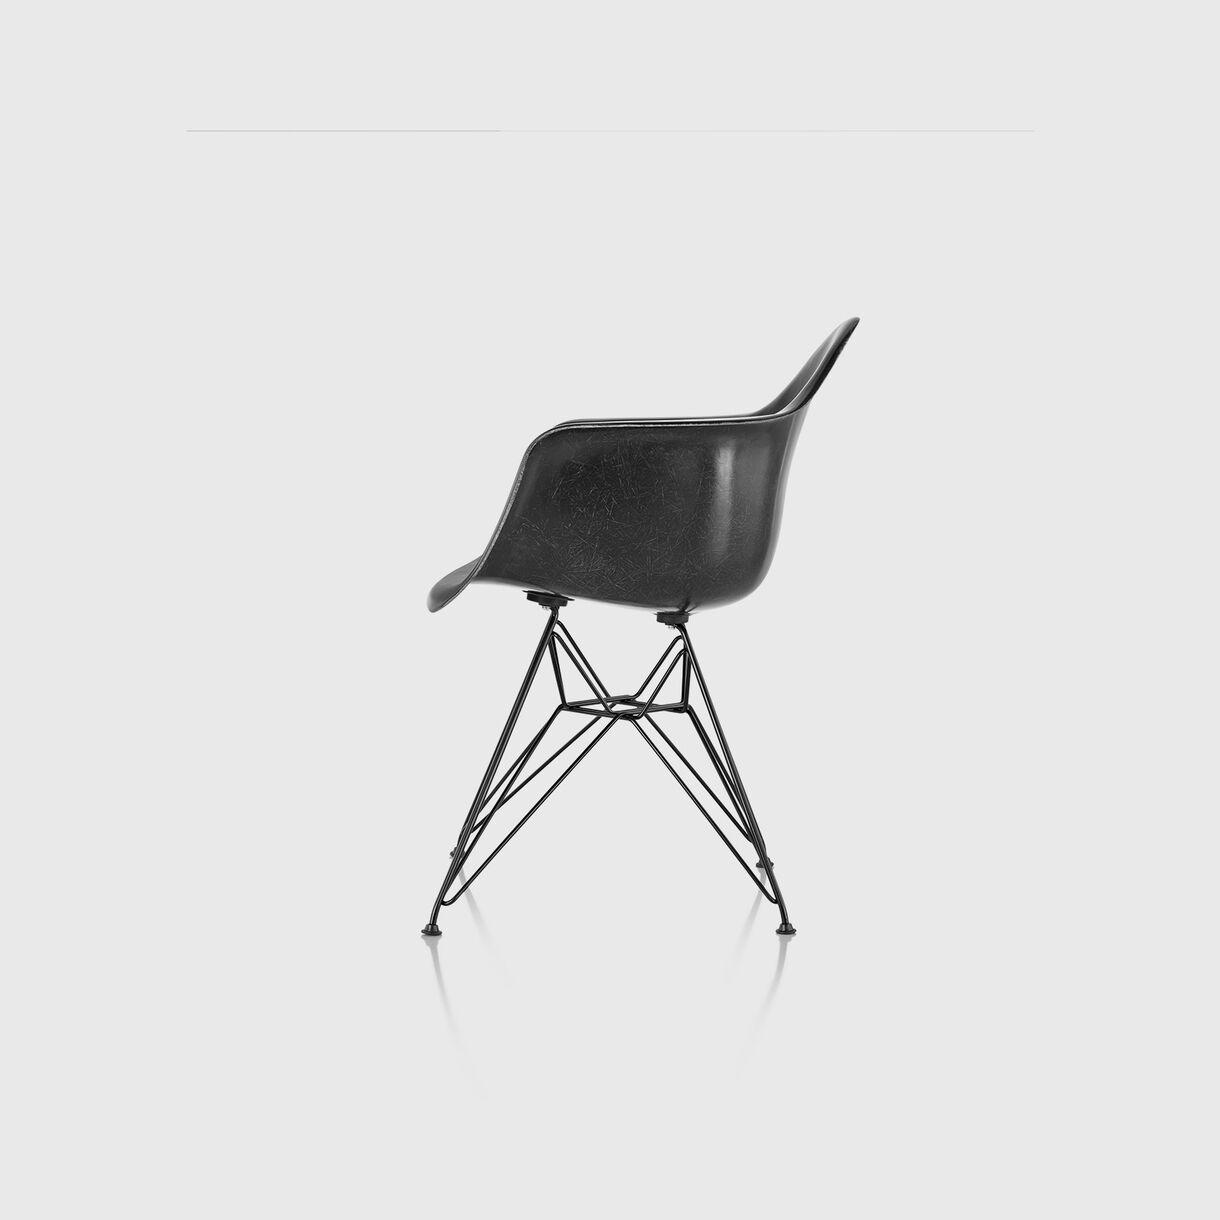 Eames Moulded Fibreglass Armchair, Wire Base, Black